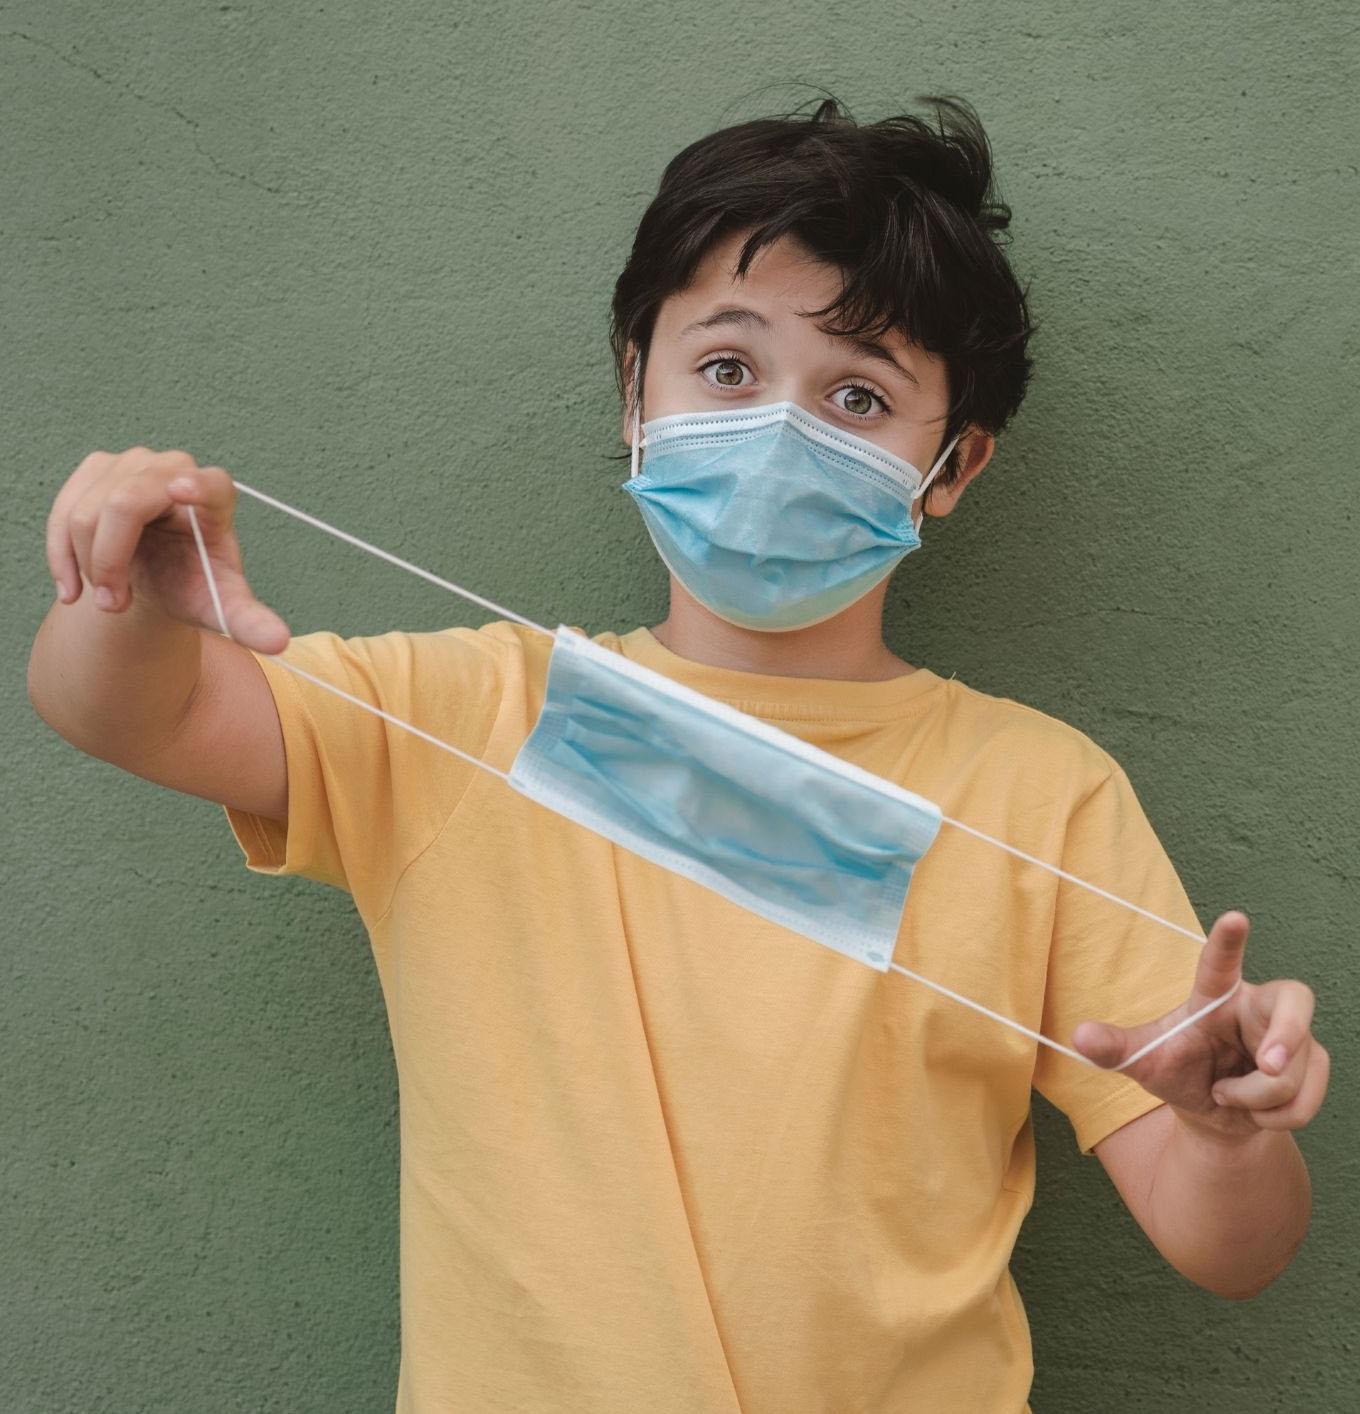 enfant-porte-masque-chirurgical